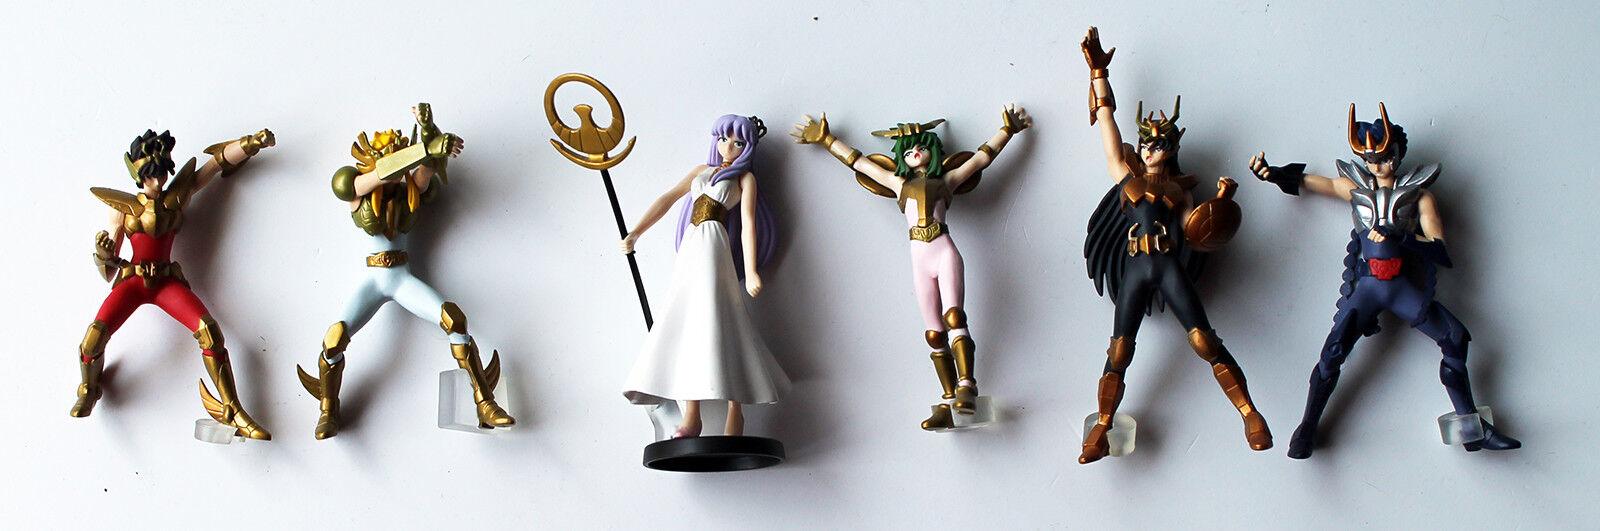 HGIF Saint Seiya  5 Bandai Gashapon Minifigure